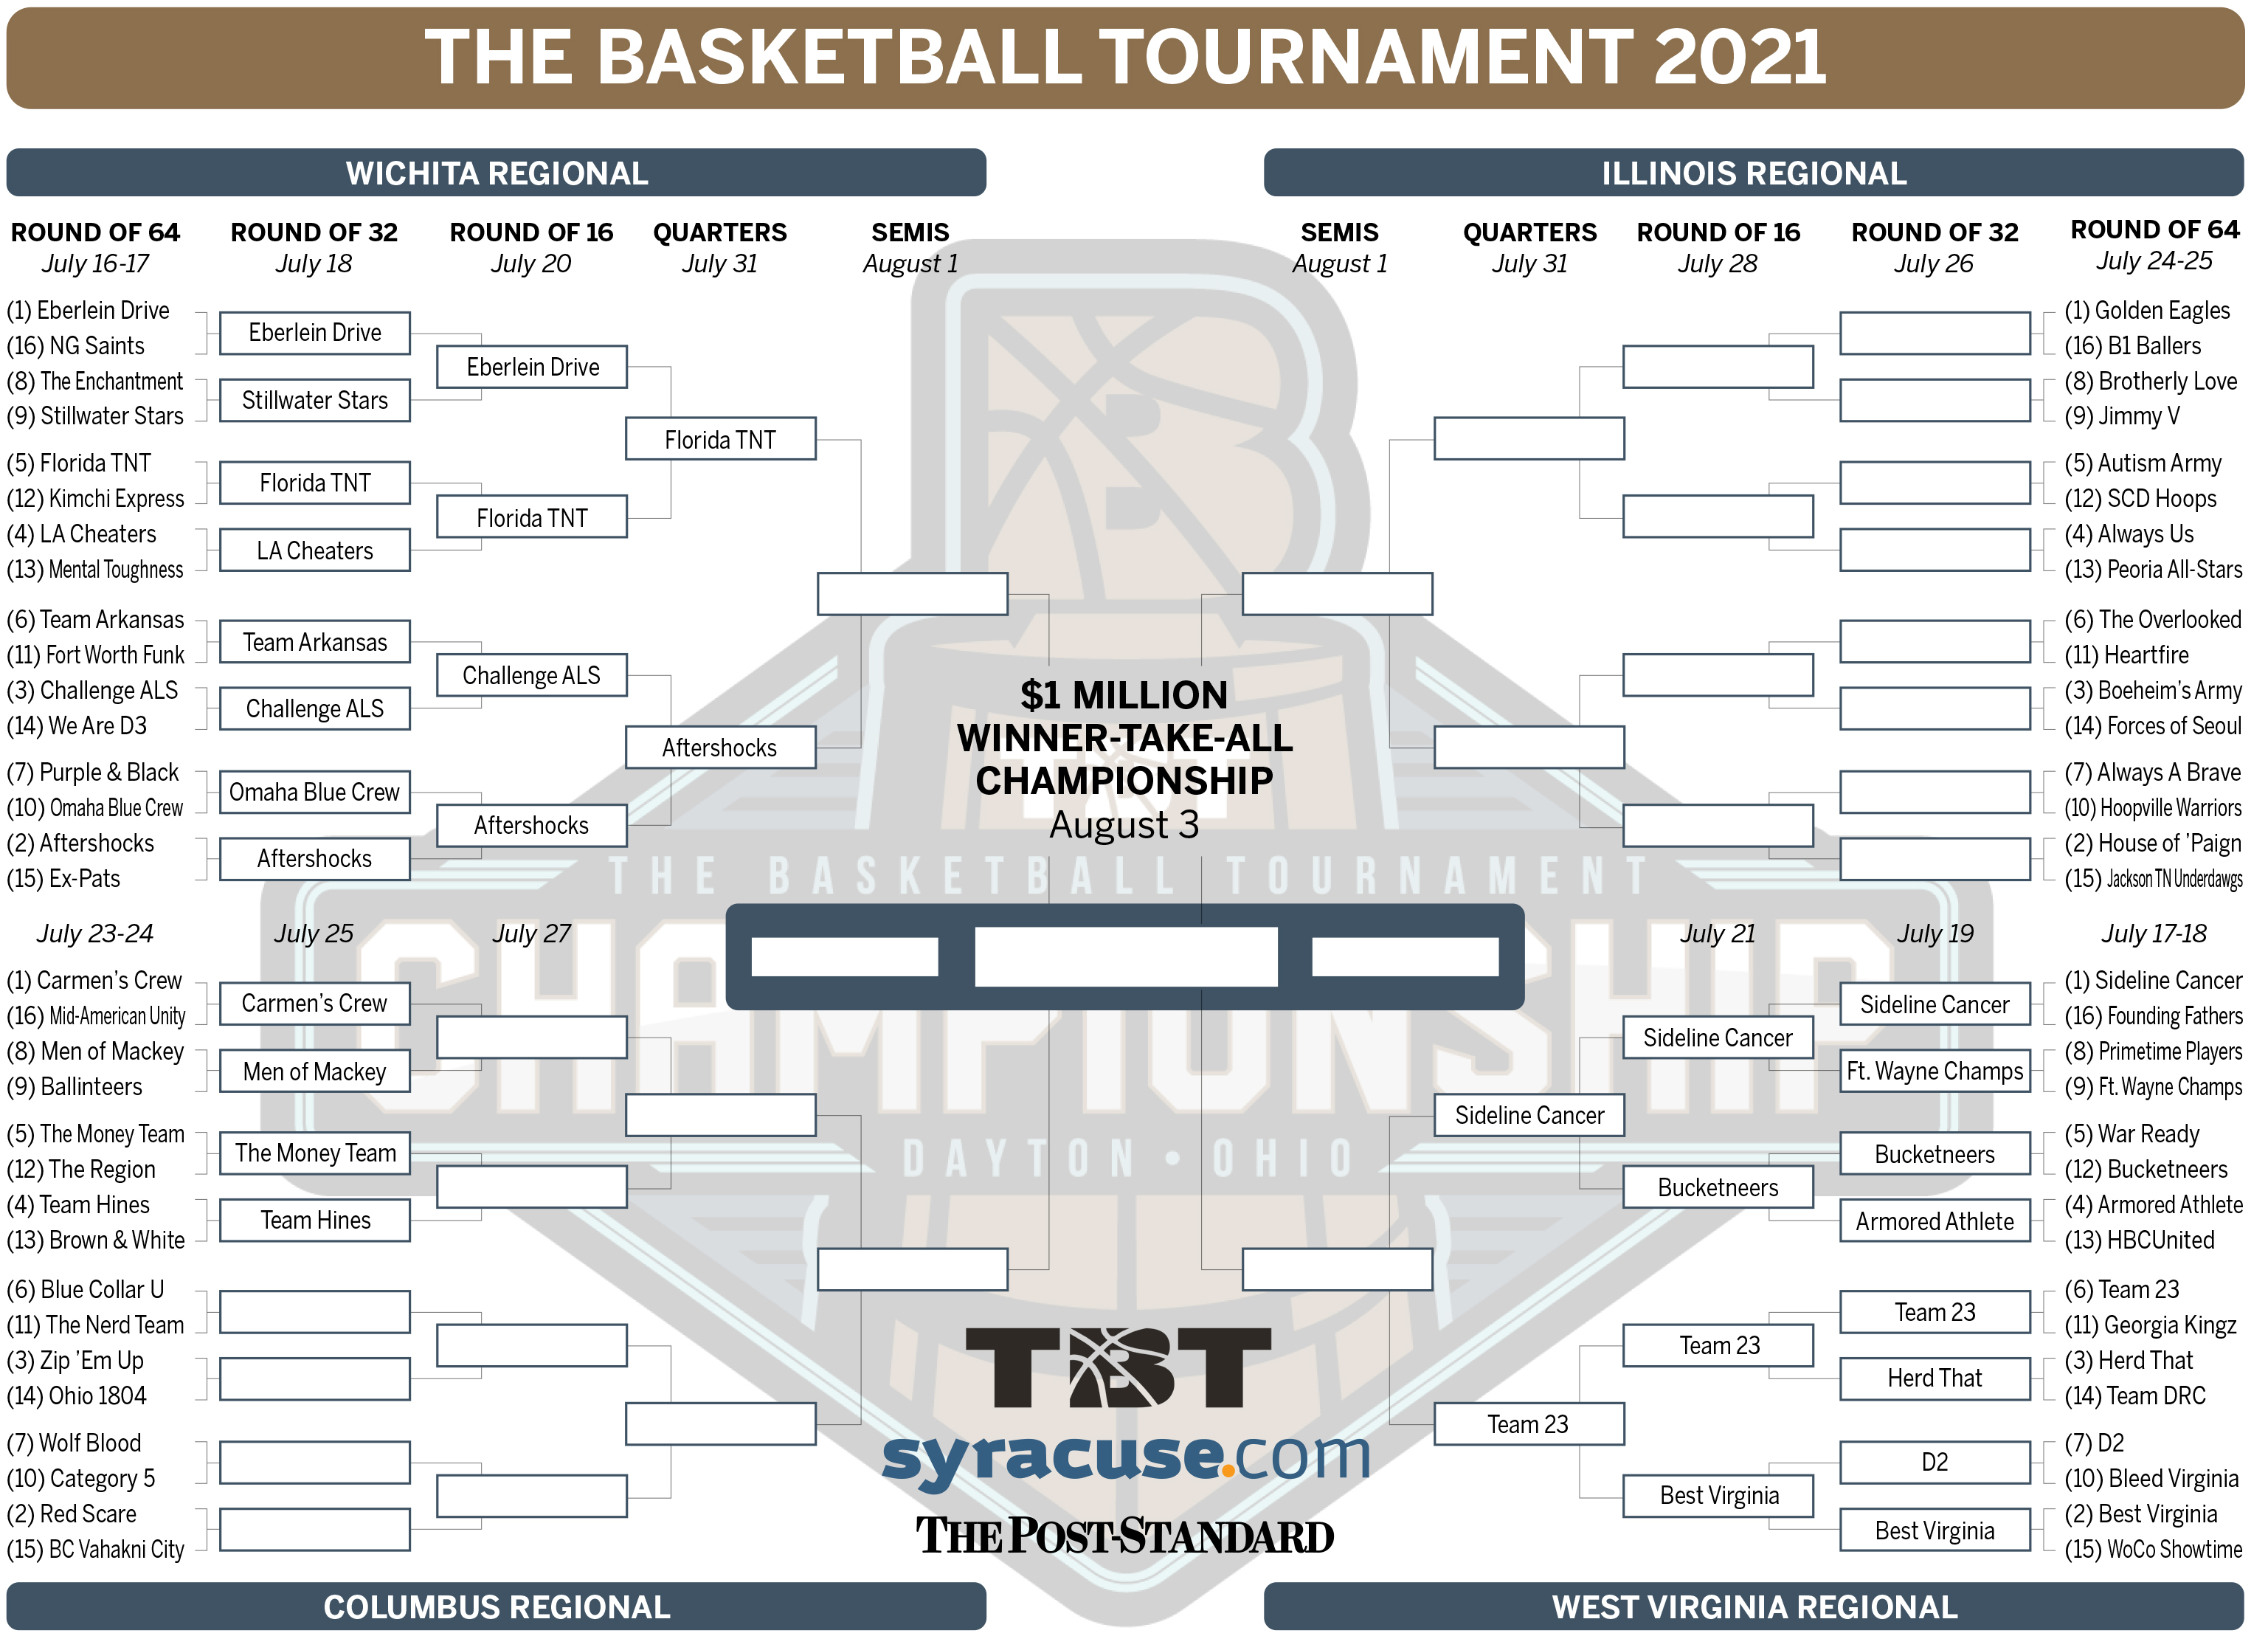 2021 TBT The Basketball Tournament Bracket